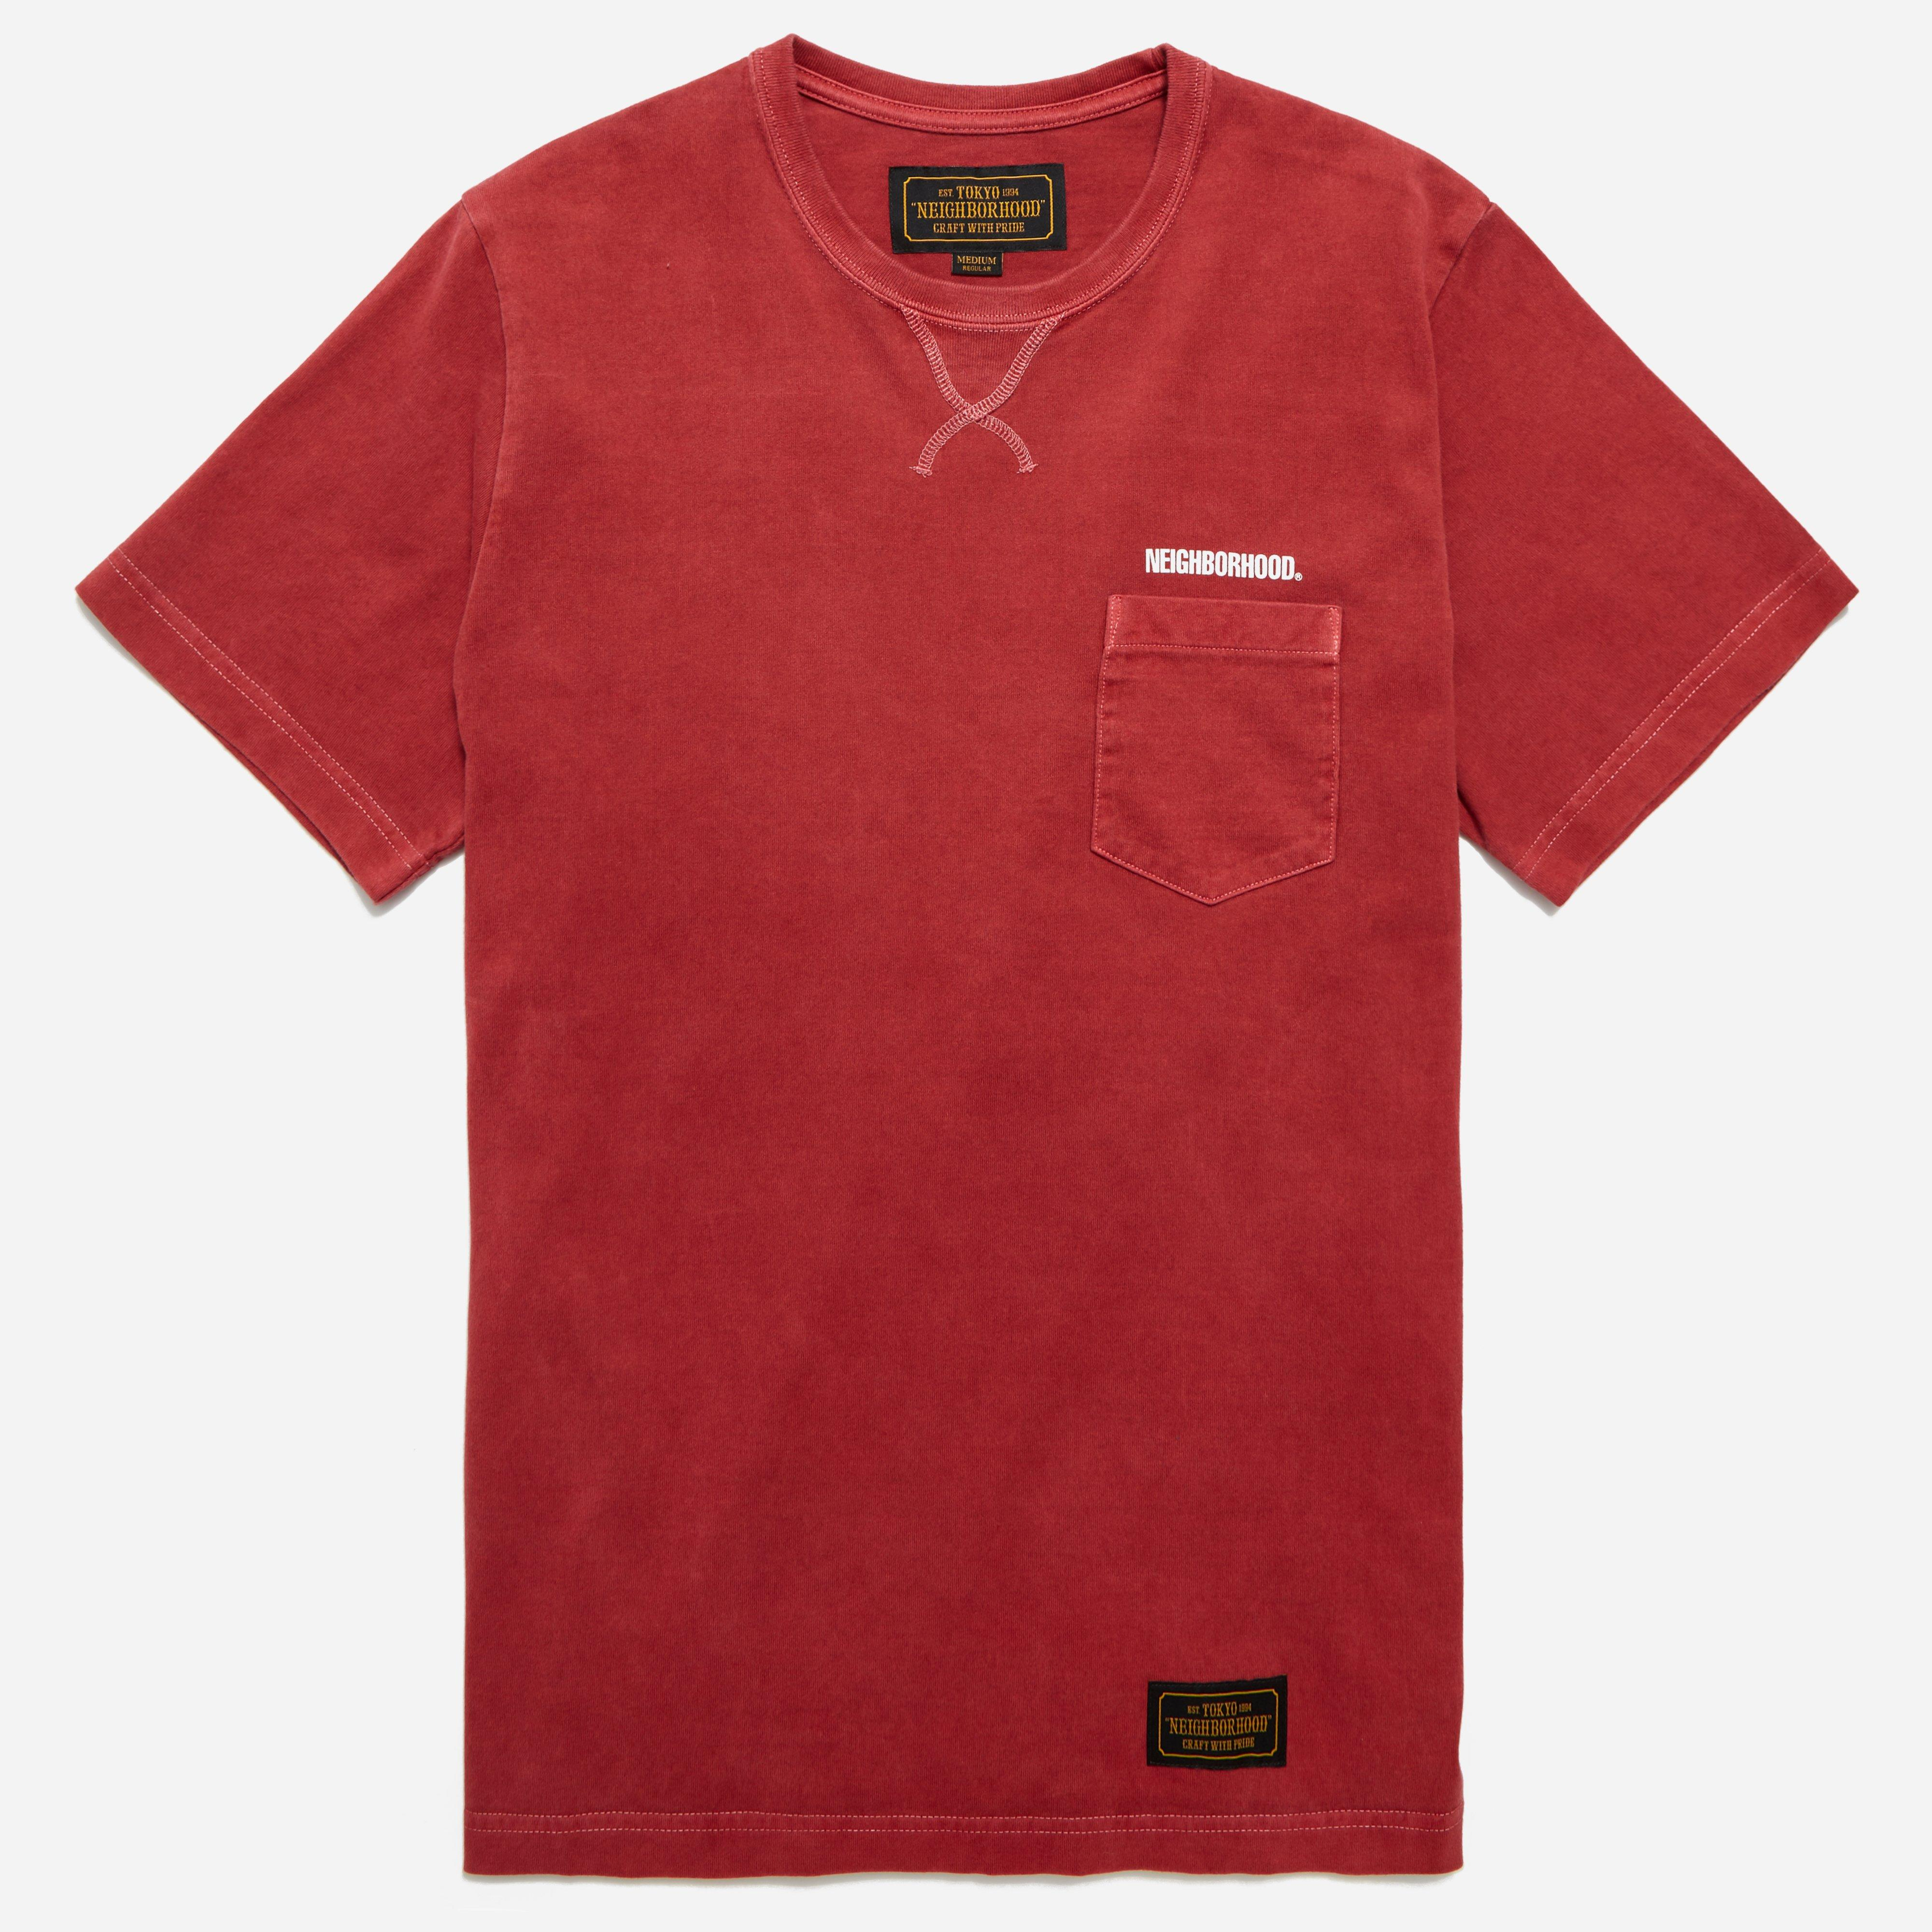 Neighborhood Classic Pocket T-shirt